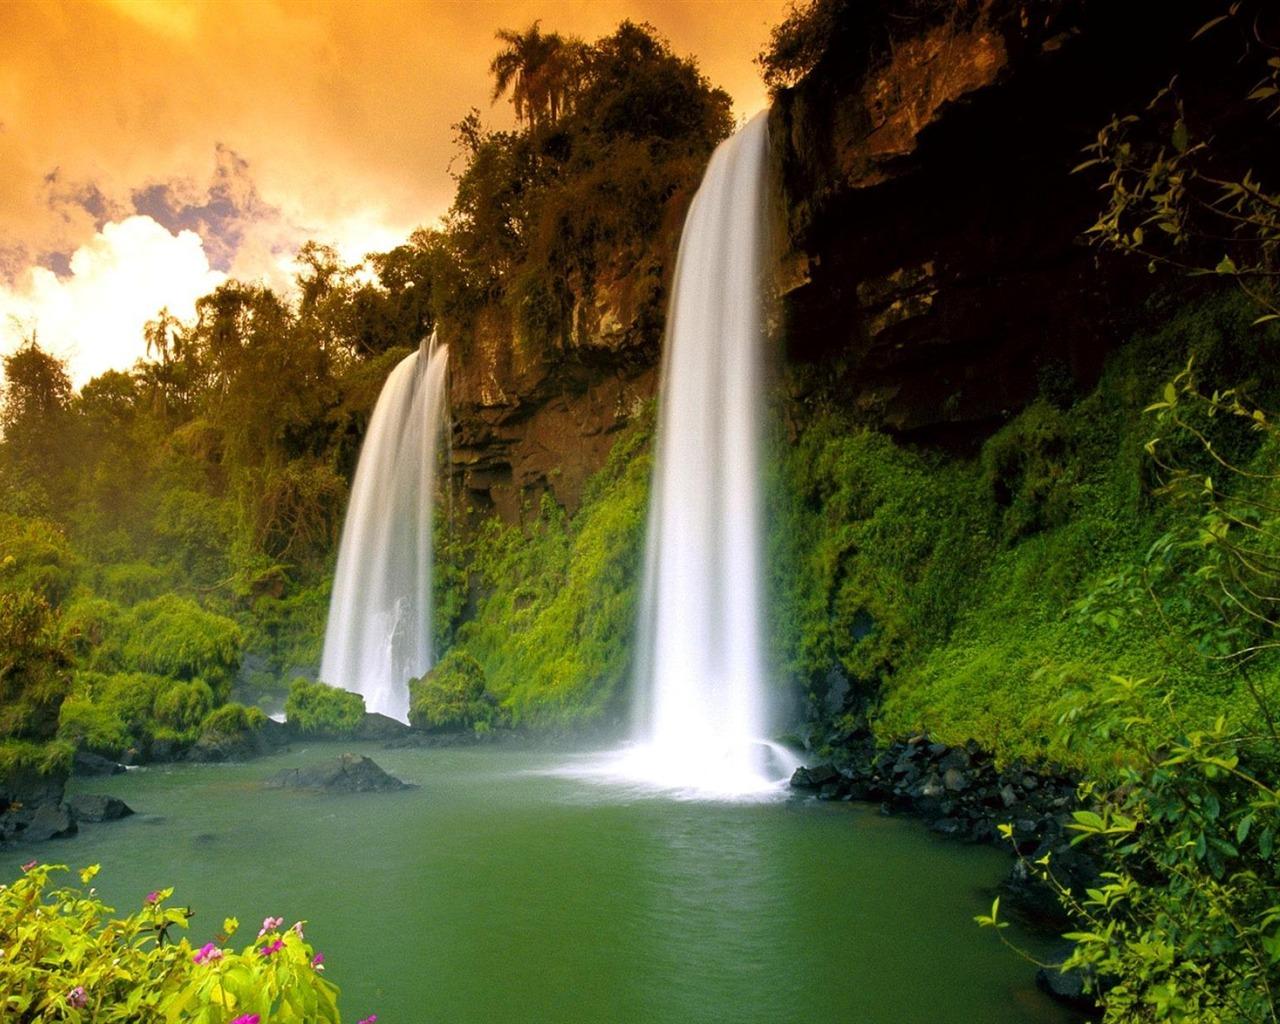 9 Spectacular Hd Waterfall Wallpapers To Download: Spectacular Waterfalls Widescreen Desktop Wallpaper 04